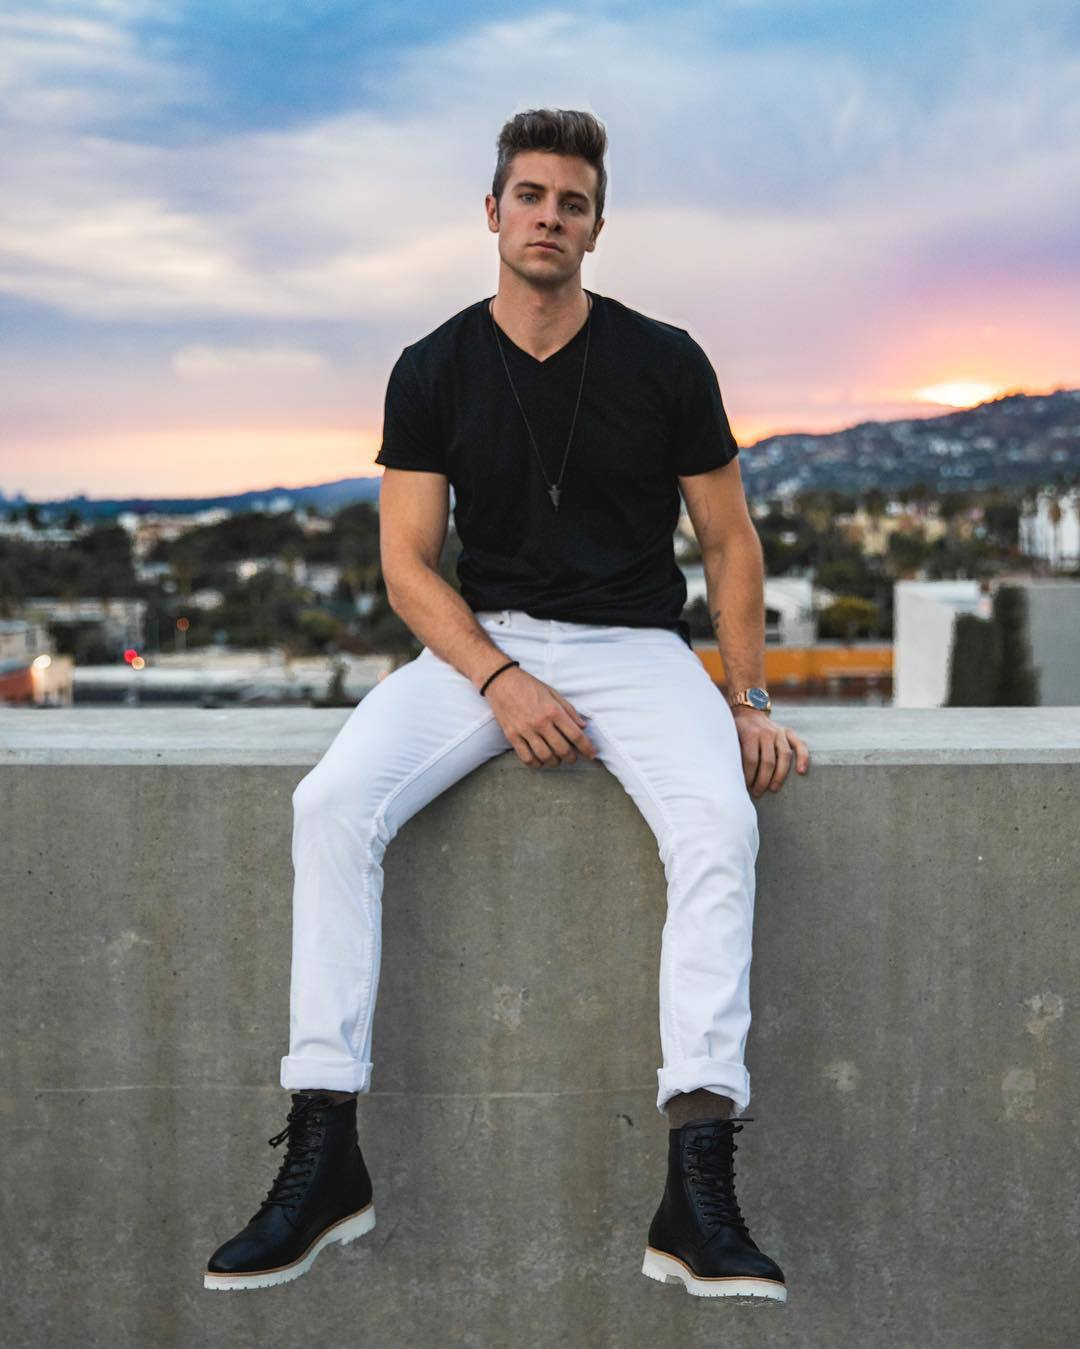 black-v-neck-t-shirt-white-jeans-black-leather-casual-boots-original-28567.jpg